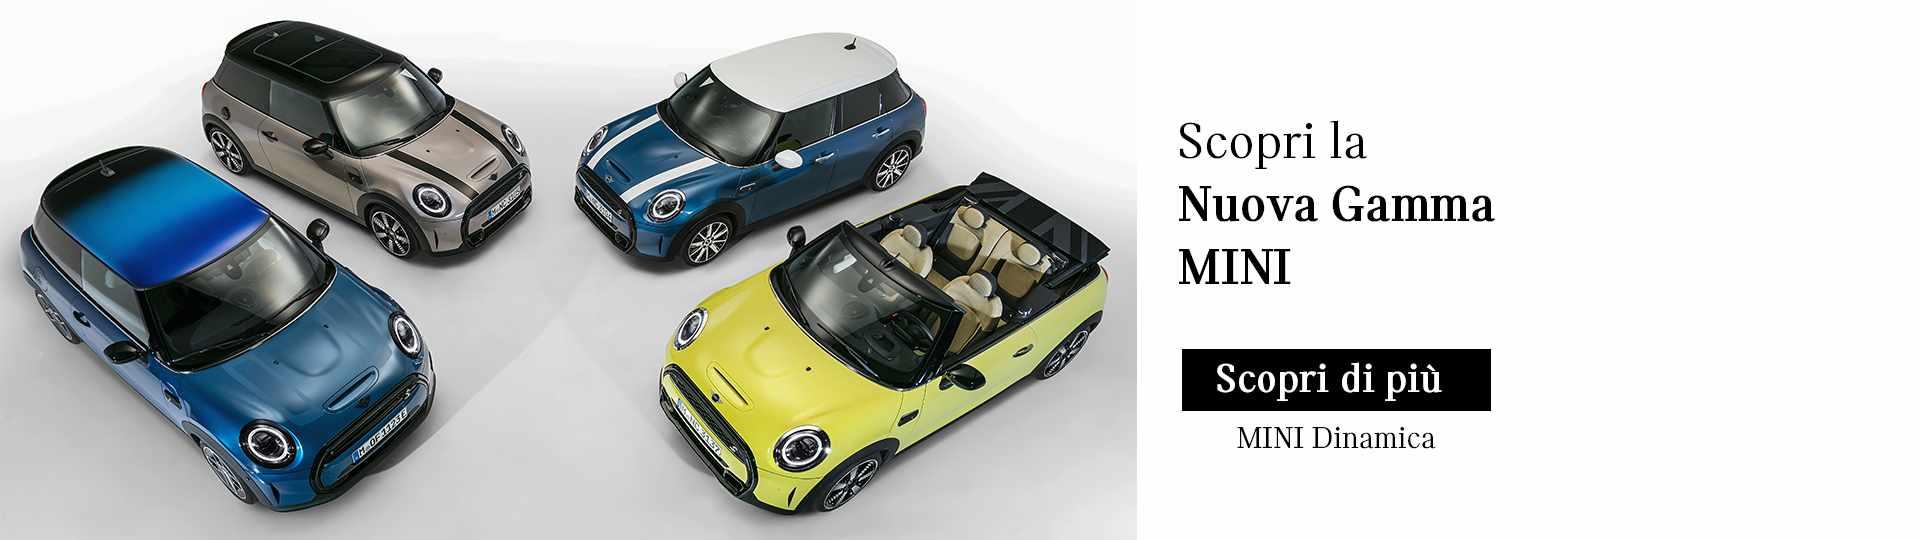 header_nuova mini hatch_maggio 2021.jpg